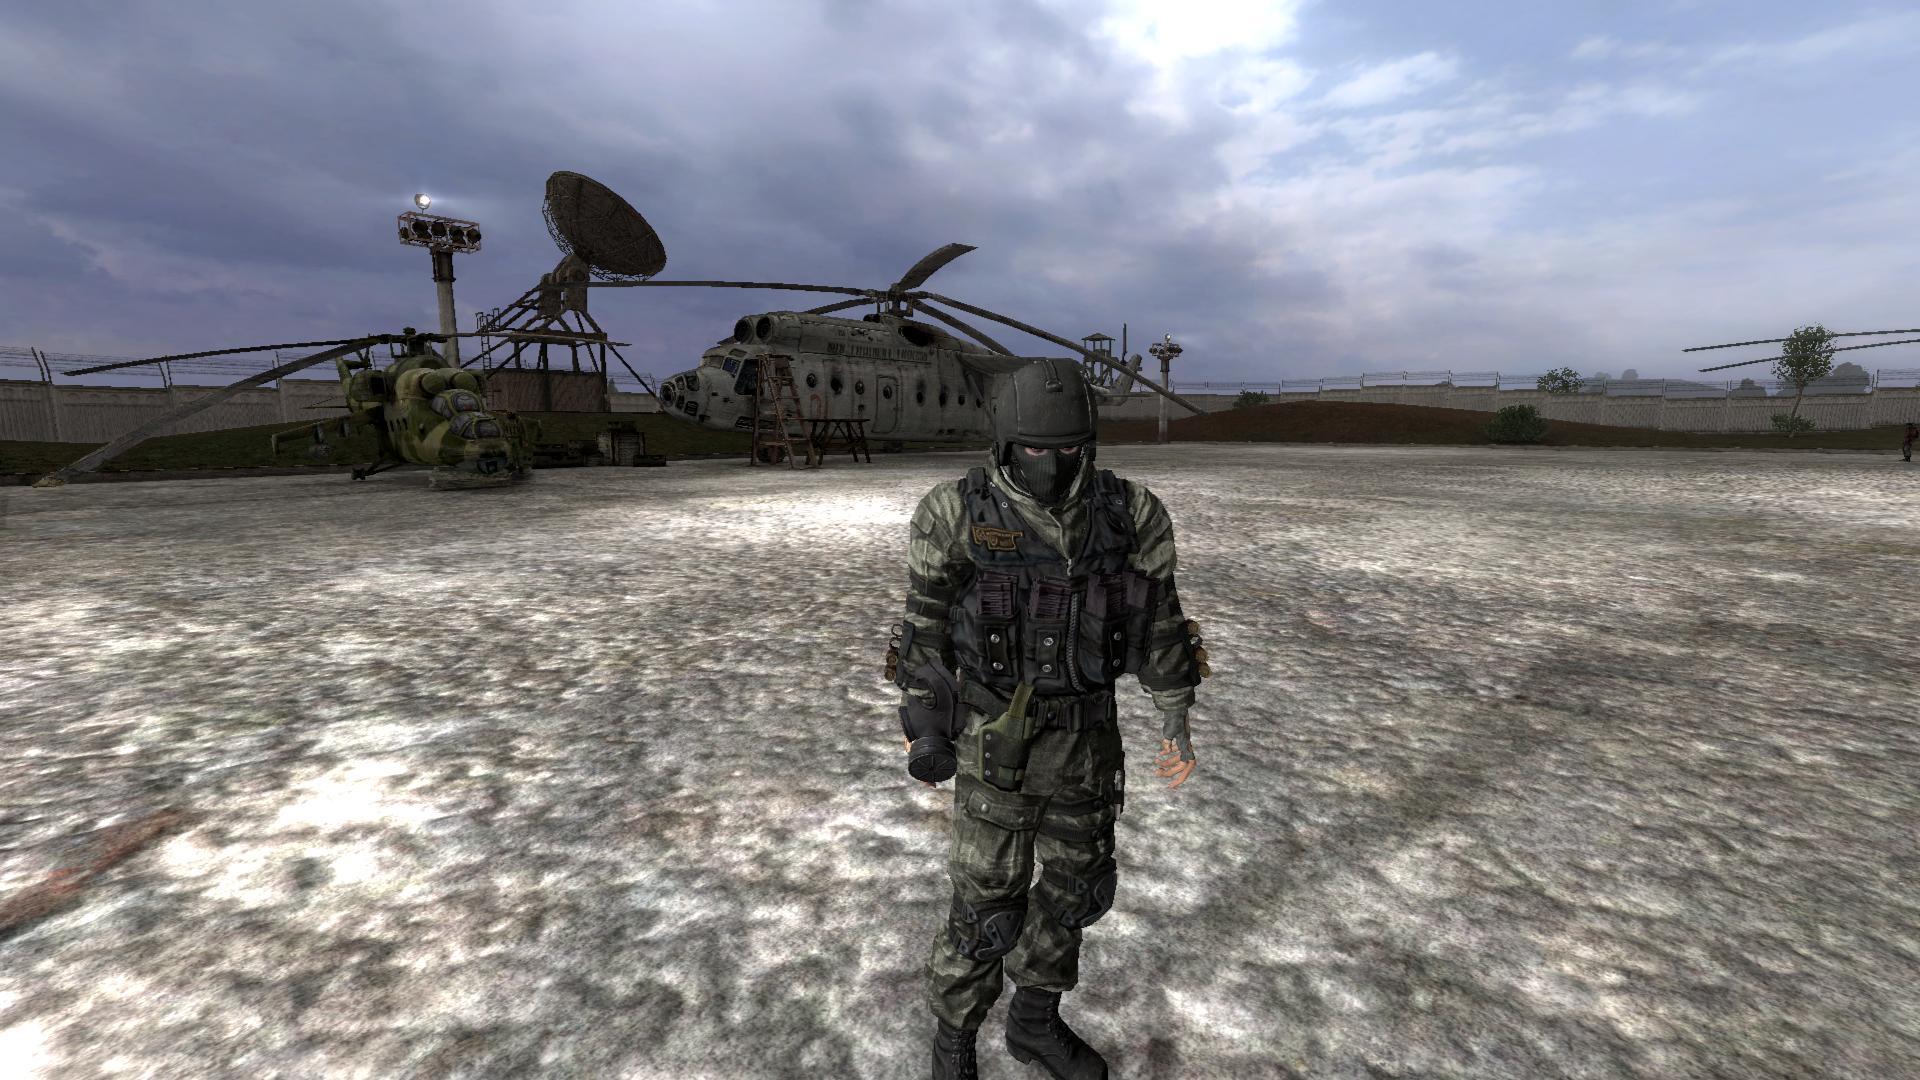 Одинокий сталкер на аэродроме